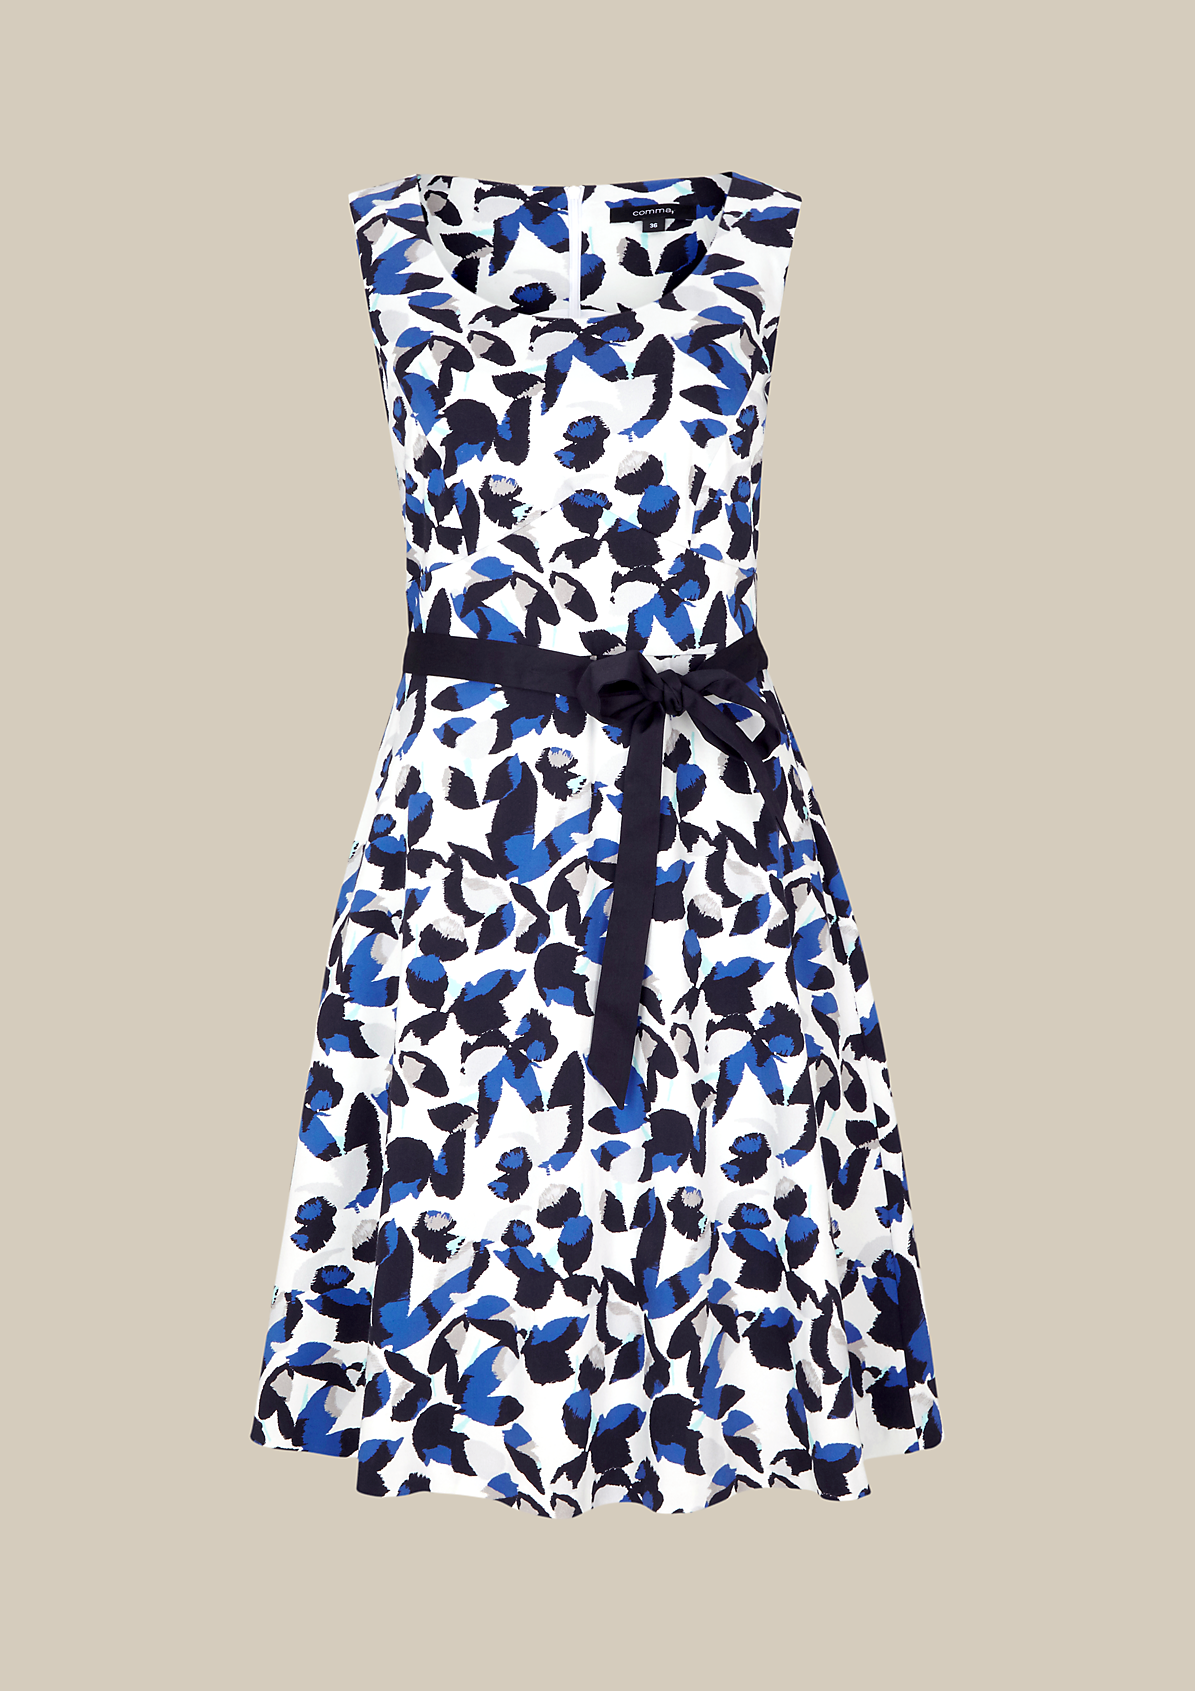 Feminines Businesskleid mit dekorativem Muster